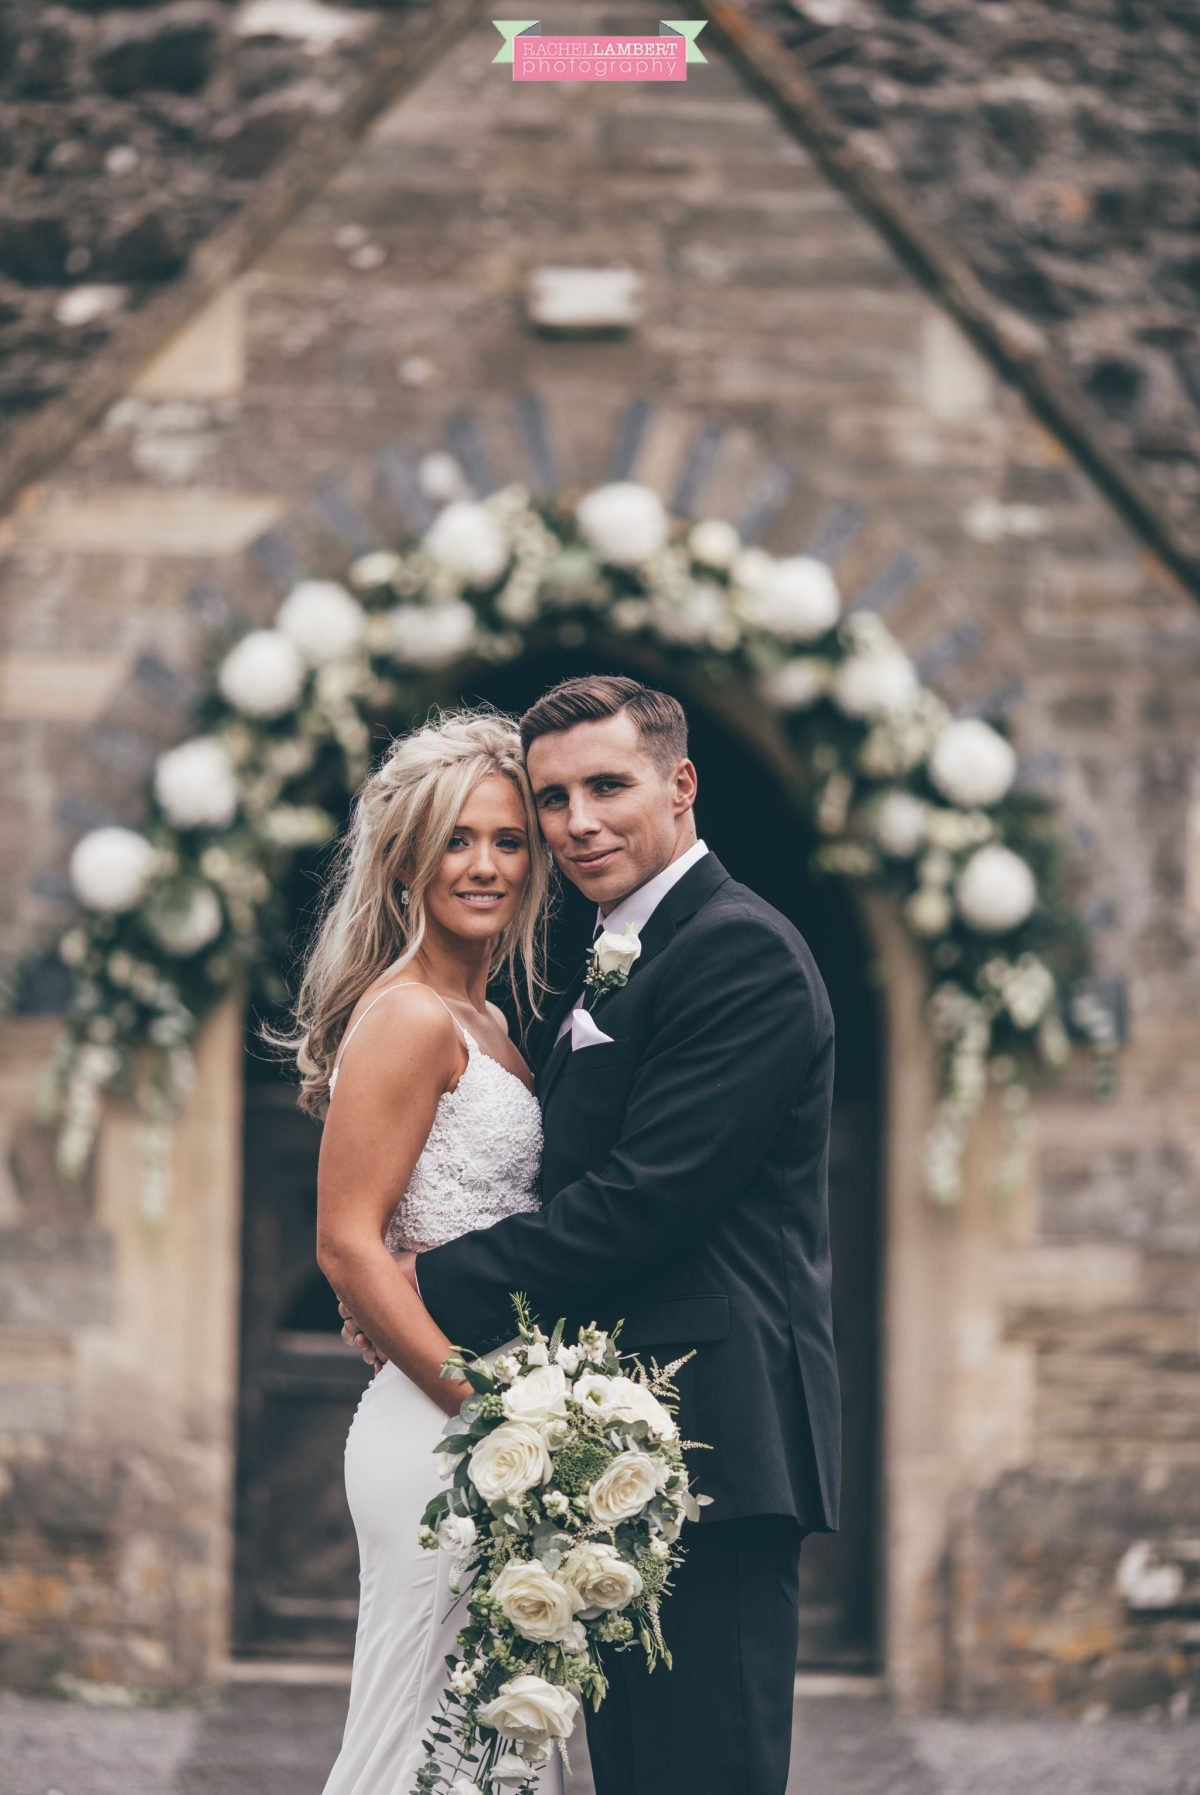 bride and groom outside church wedding flower arch bridal flowers